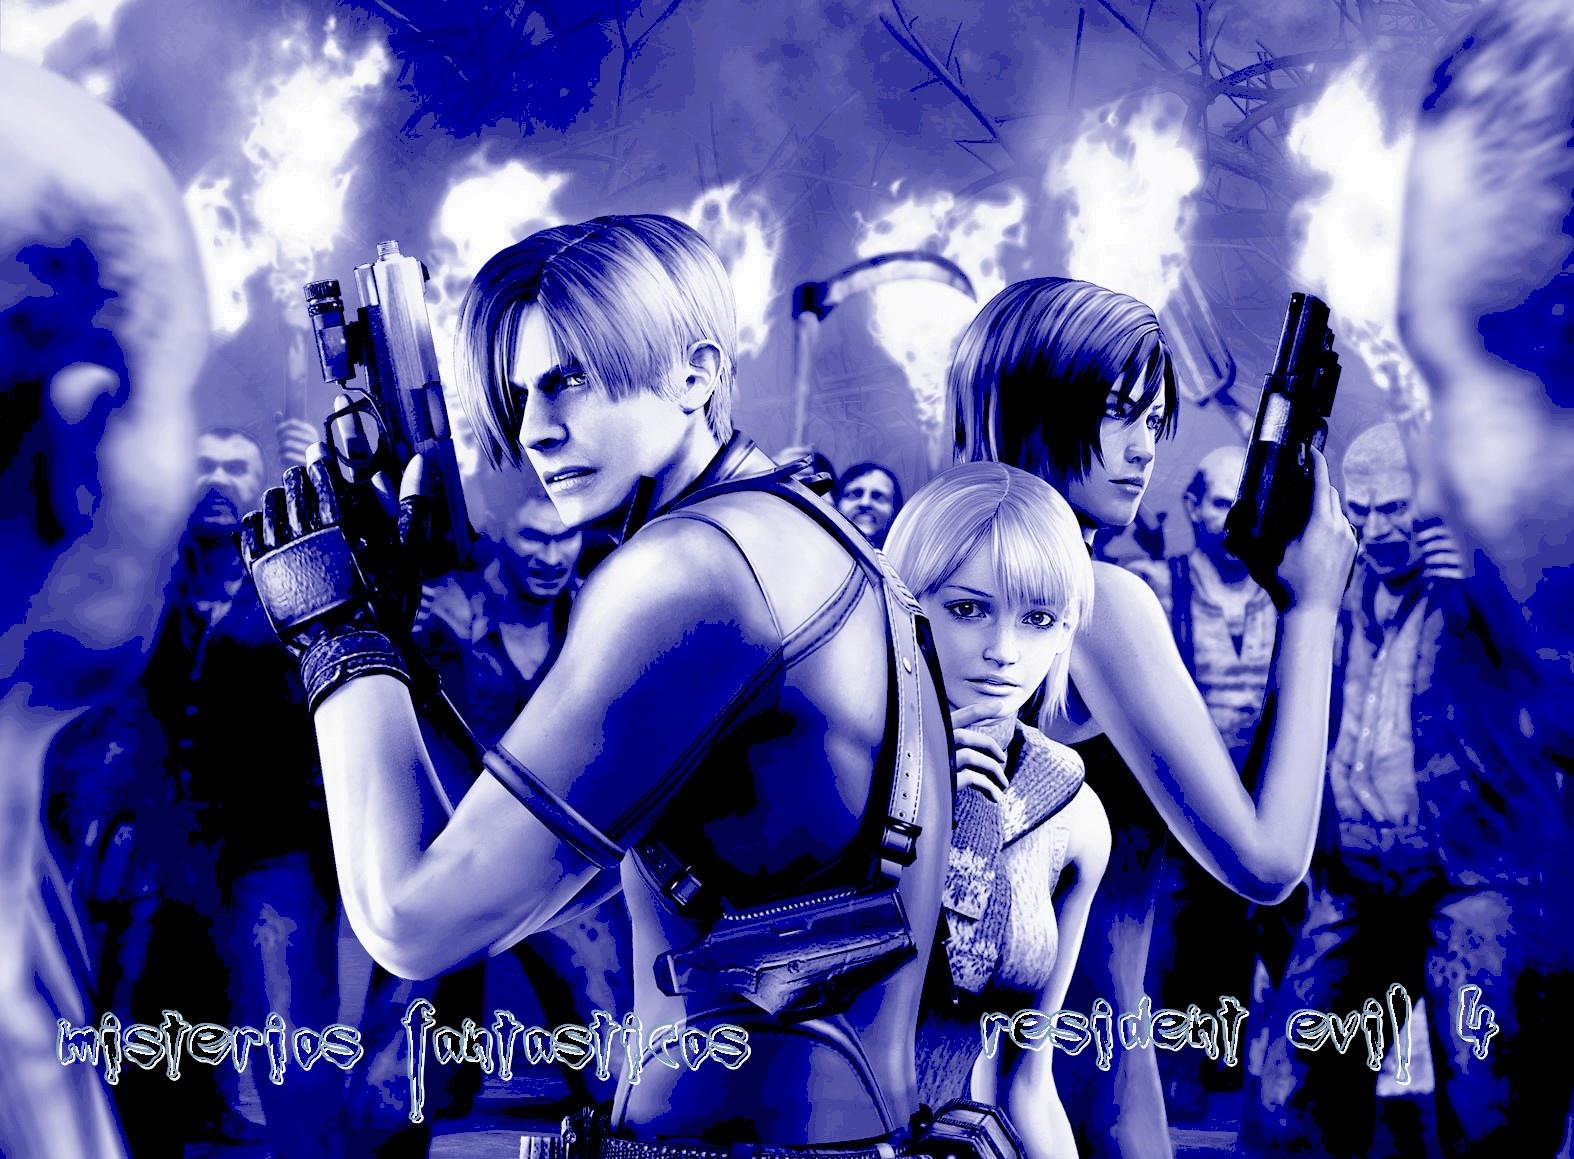 http://1.bp.blogspot.com/_36x37e5S95A/TR4tmOHkrwI/AAAAAAAACLI/h1PvF1srEC0/s1600/misterios+fantasticos+wallpaper+%252827%2529.jpg